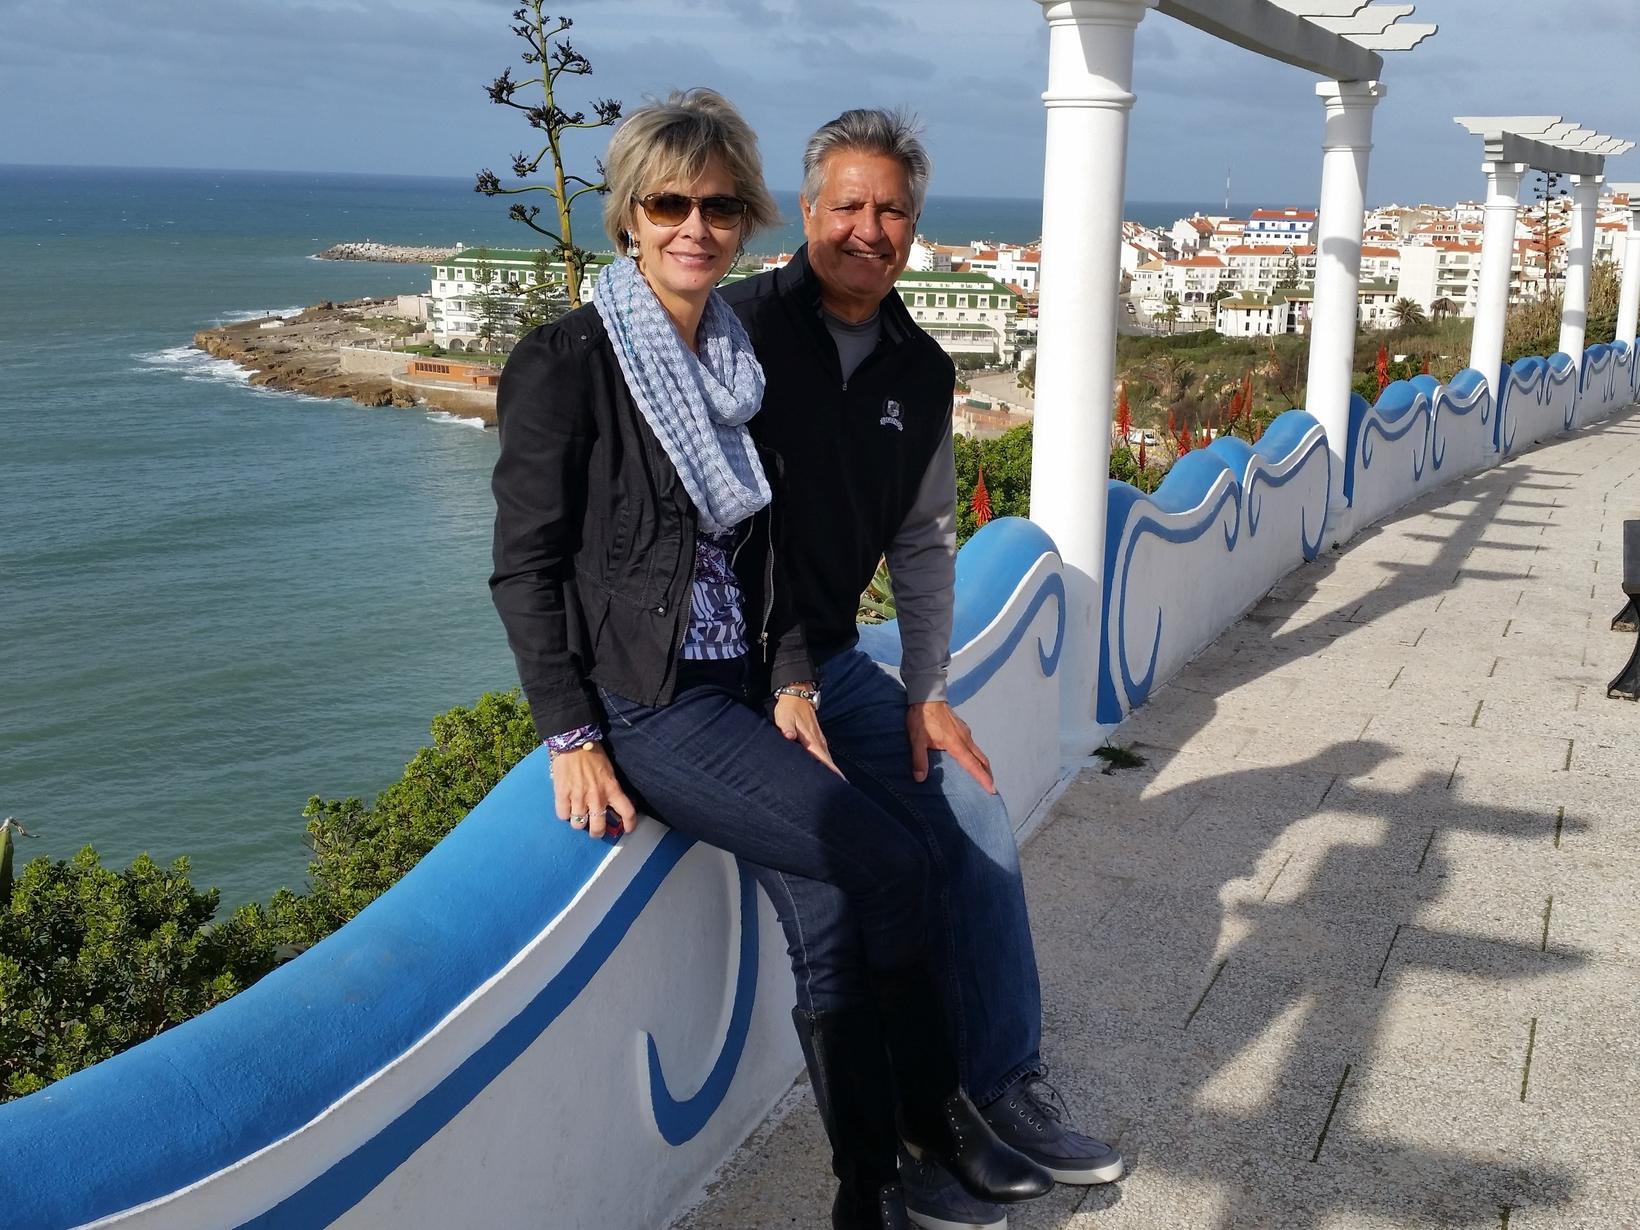 Susan & Ruben from Myrtle Beach, South Carolina, United States